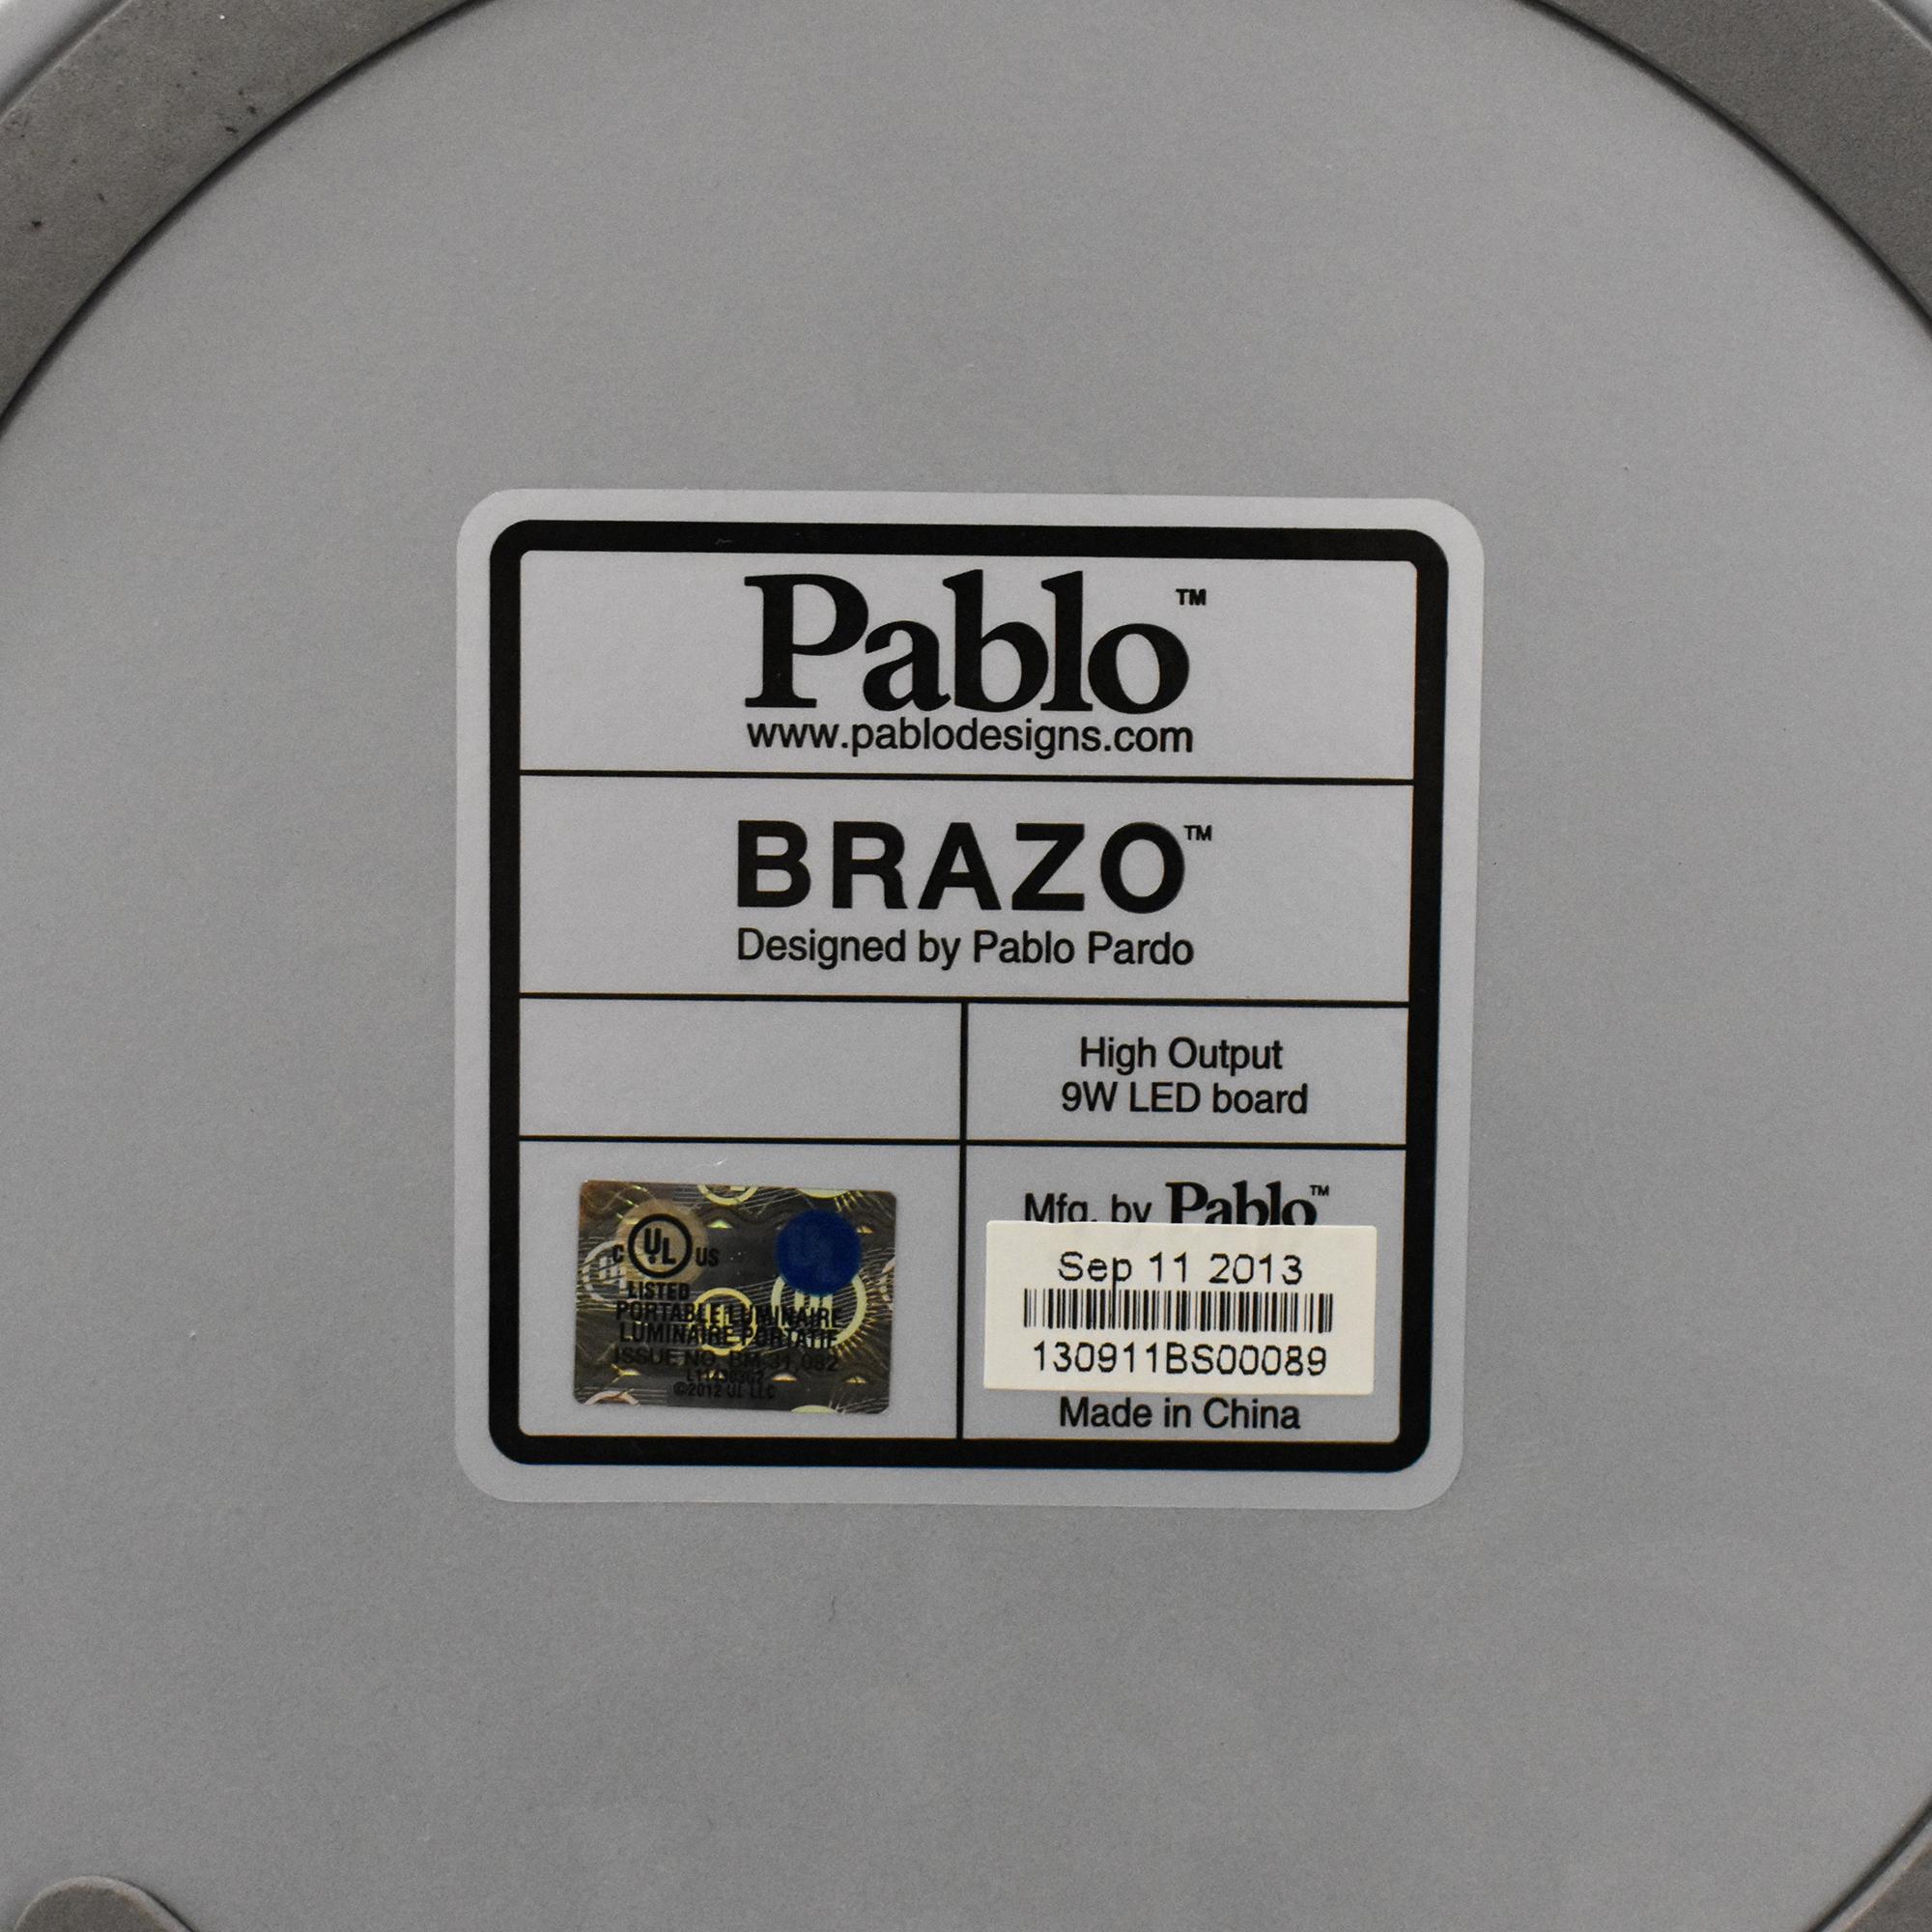 buy Pablo Designs Brazo Table Lamp Pablo Designs Lamps